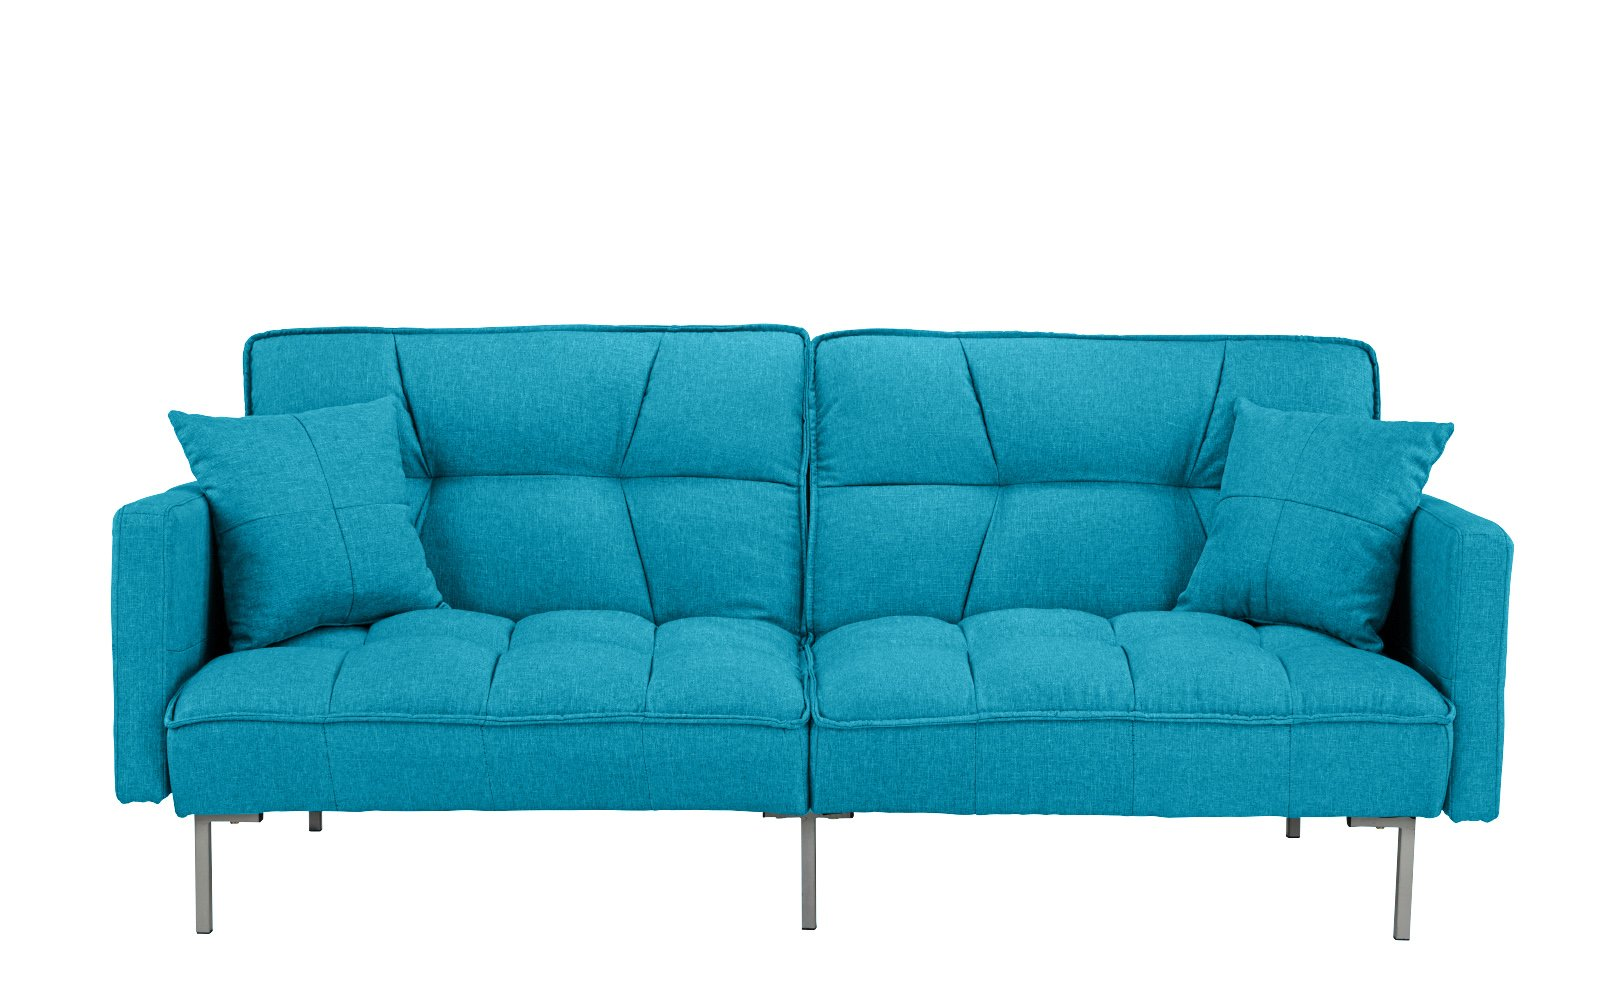 DIVANO ROMA FURNITURE Collection - Modern Plush Tufted Linen Fabric Splitback Living Room Sleeper Futon (Light Blue) by DIVANO ROMA FURNITURE